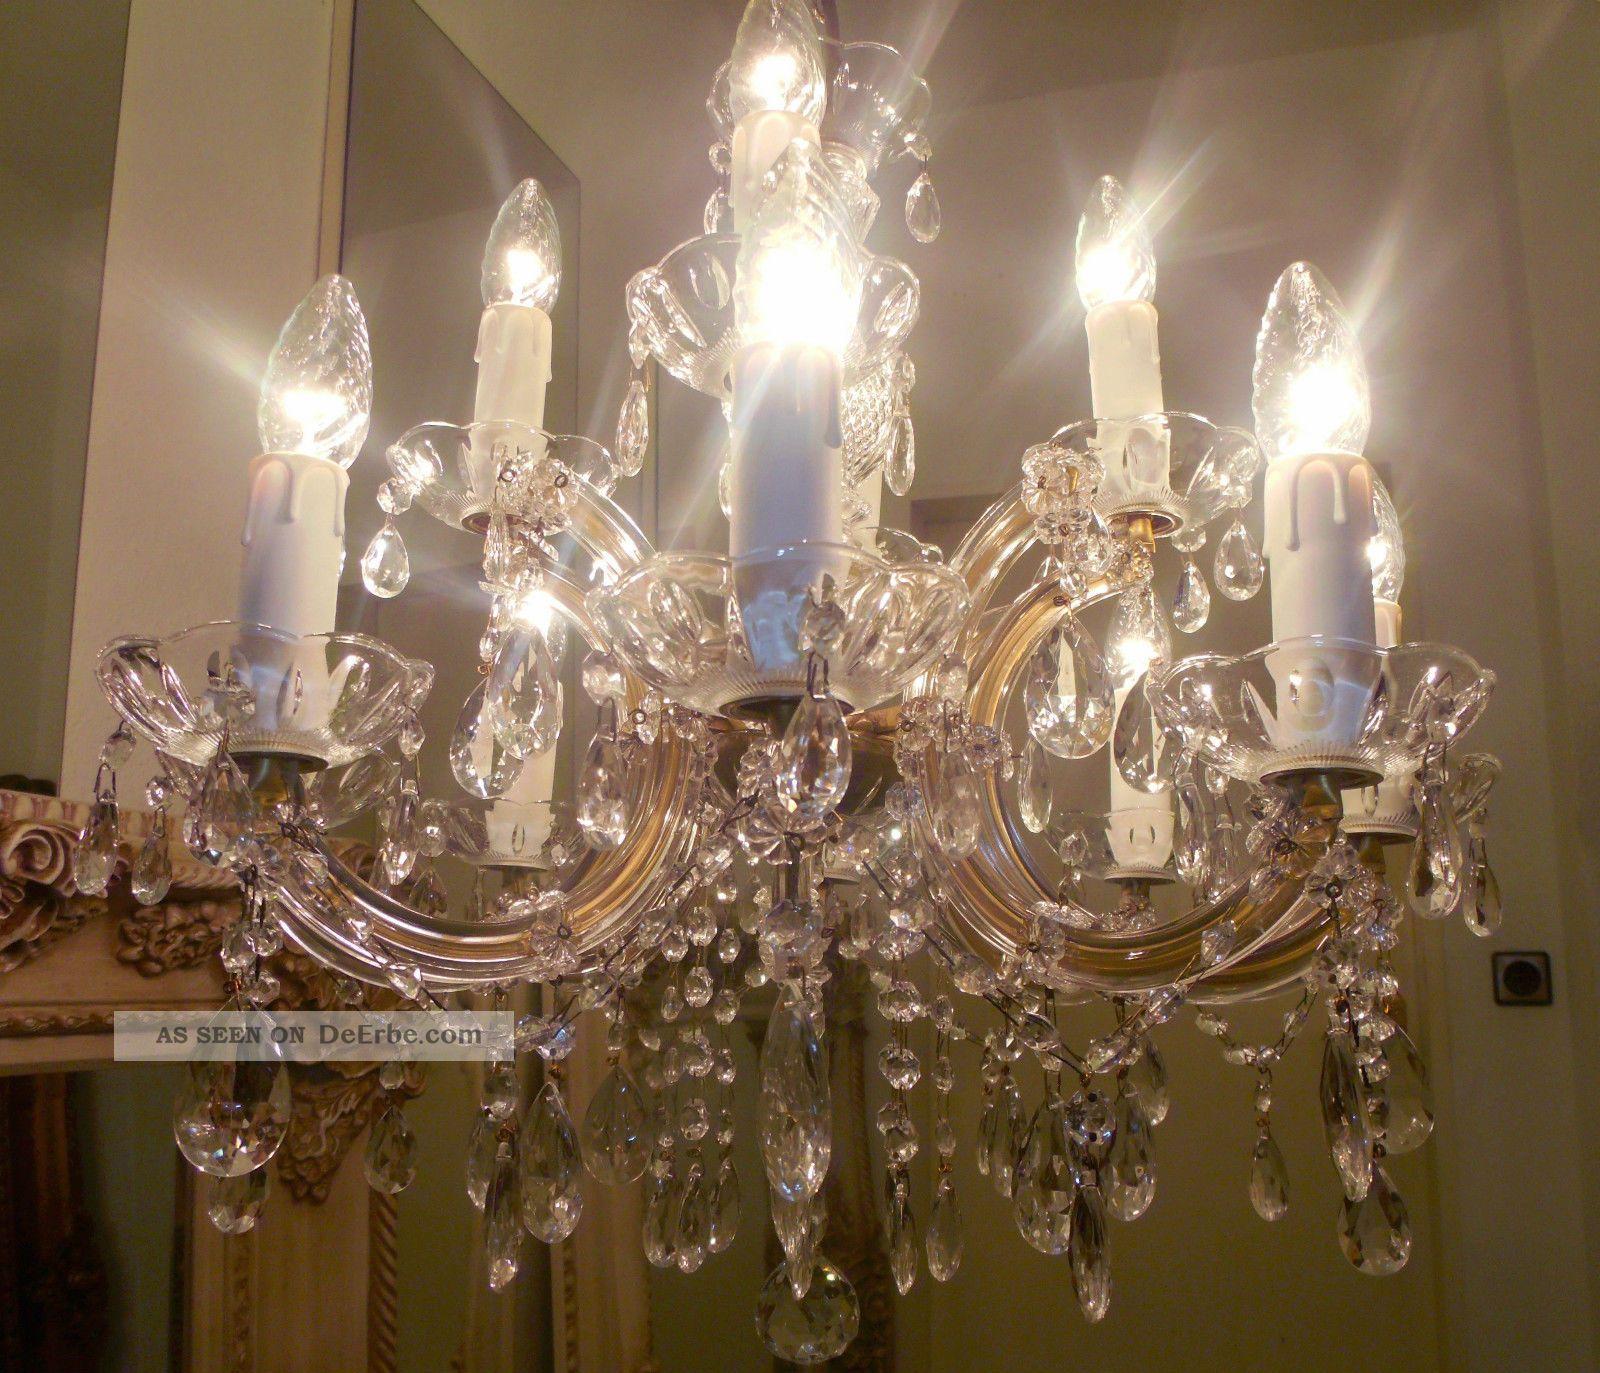 Kronleuchter 12 flammig kristall l ster maria theresia lampe chandelier barock - Kronleuchter stehlampe ...